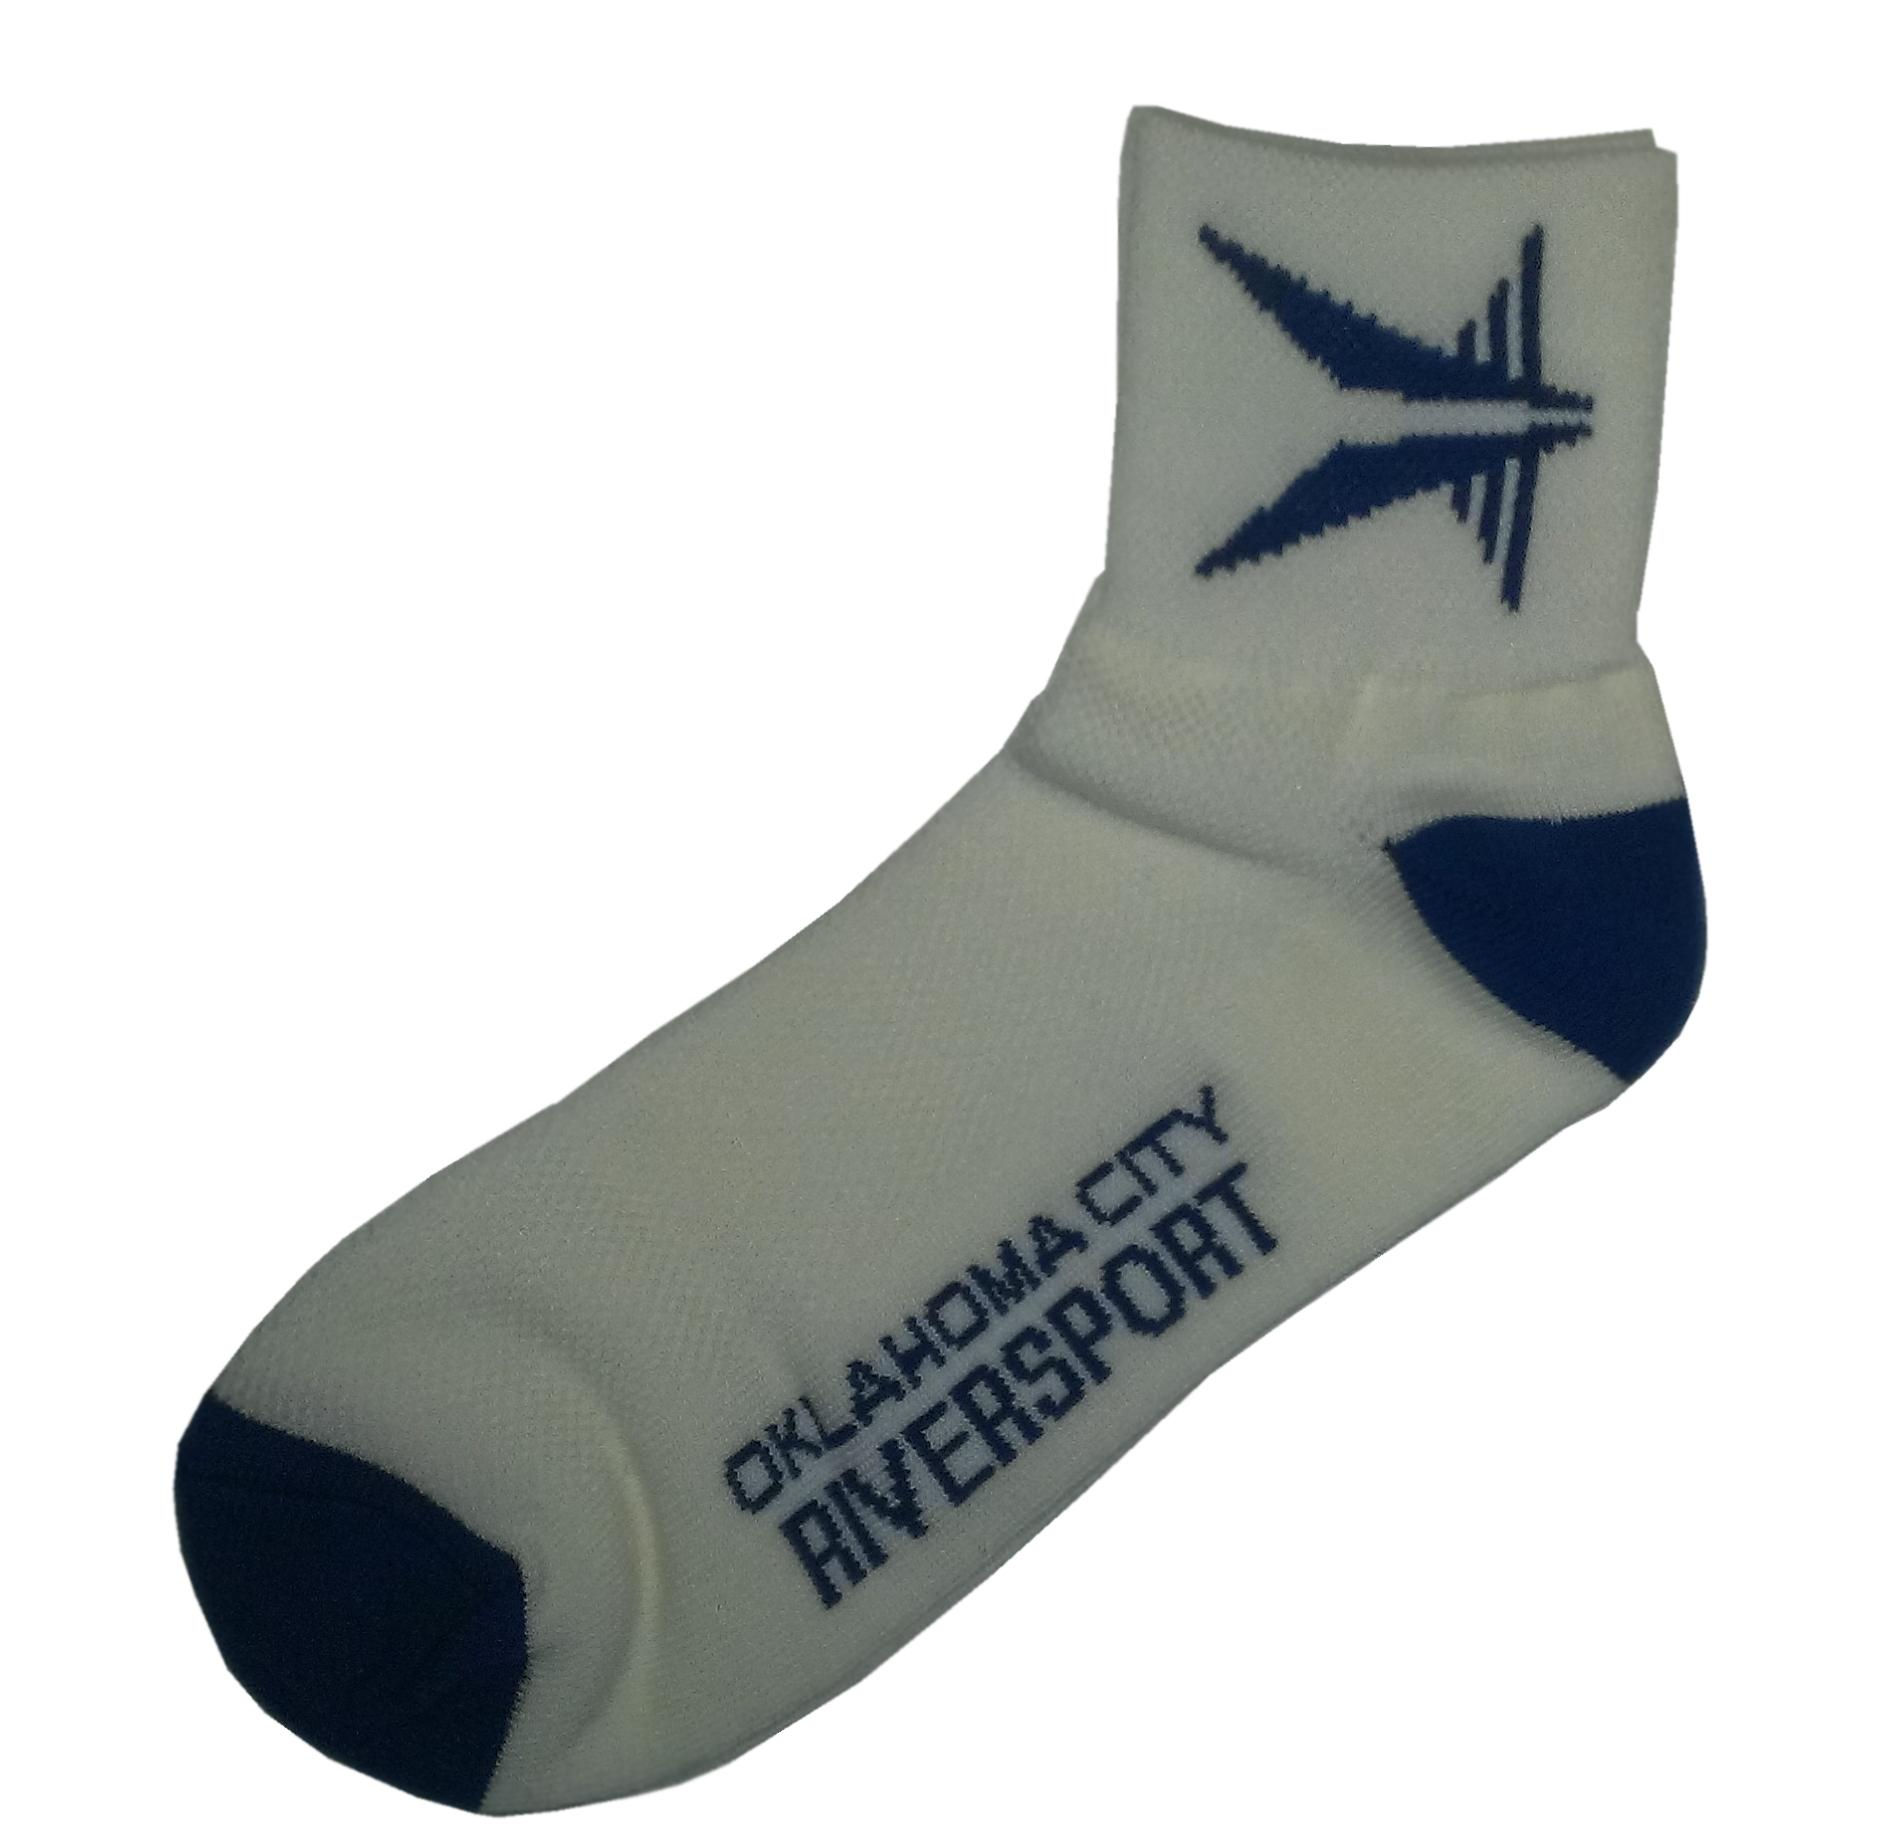 Custom-Socks-NLZ-Oklahoma-Riversport.jpg